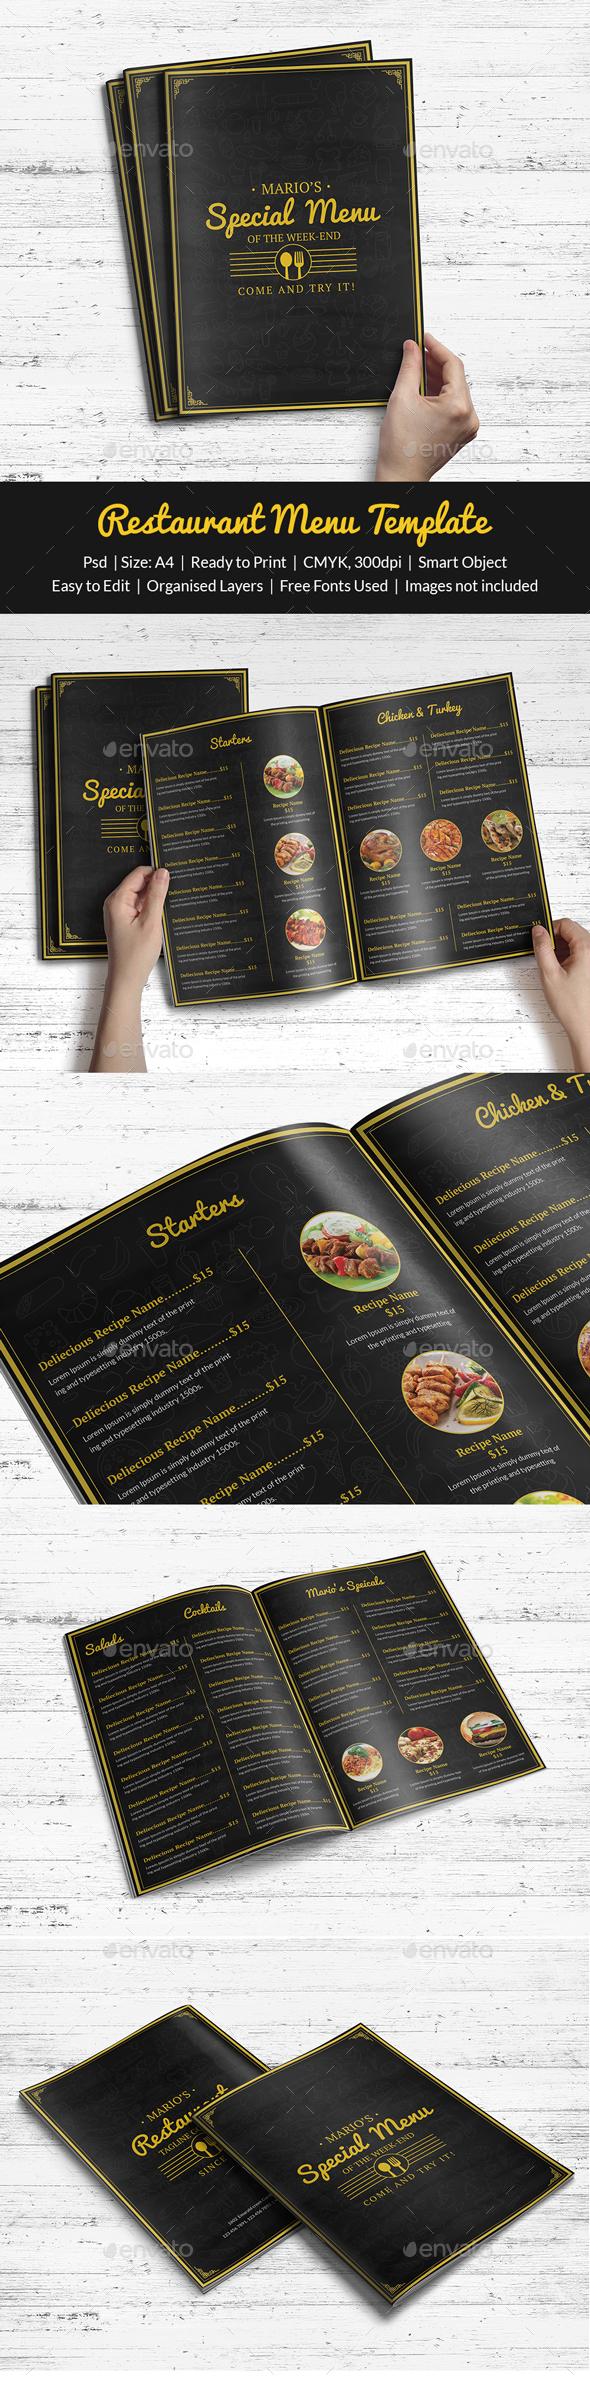 Restaurant Menu - Print Templates